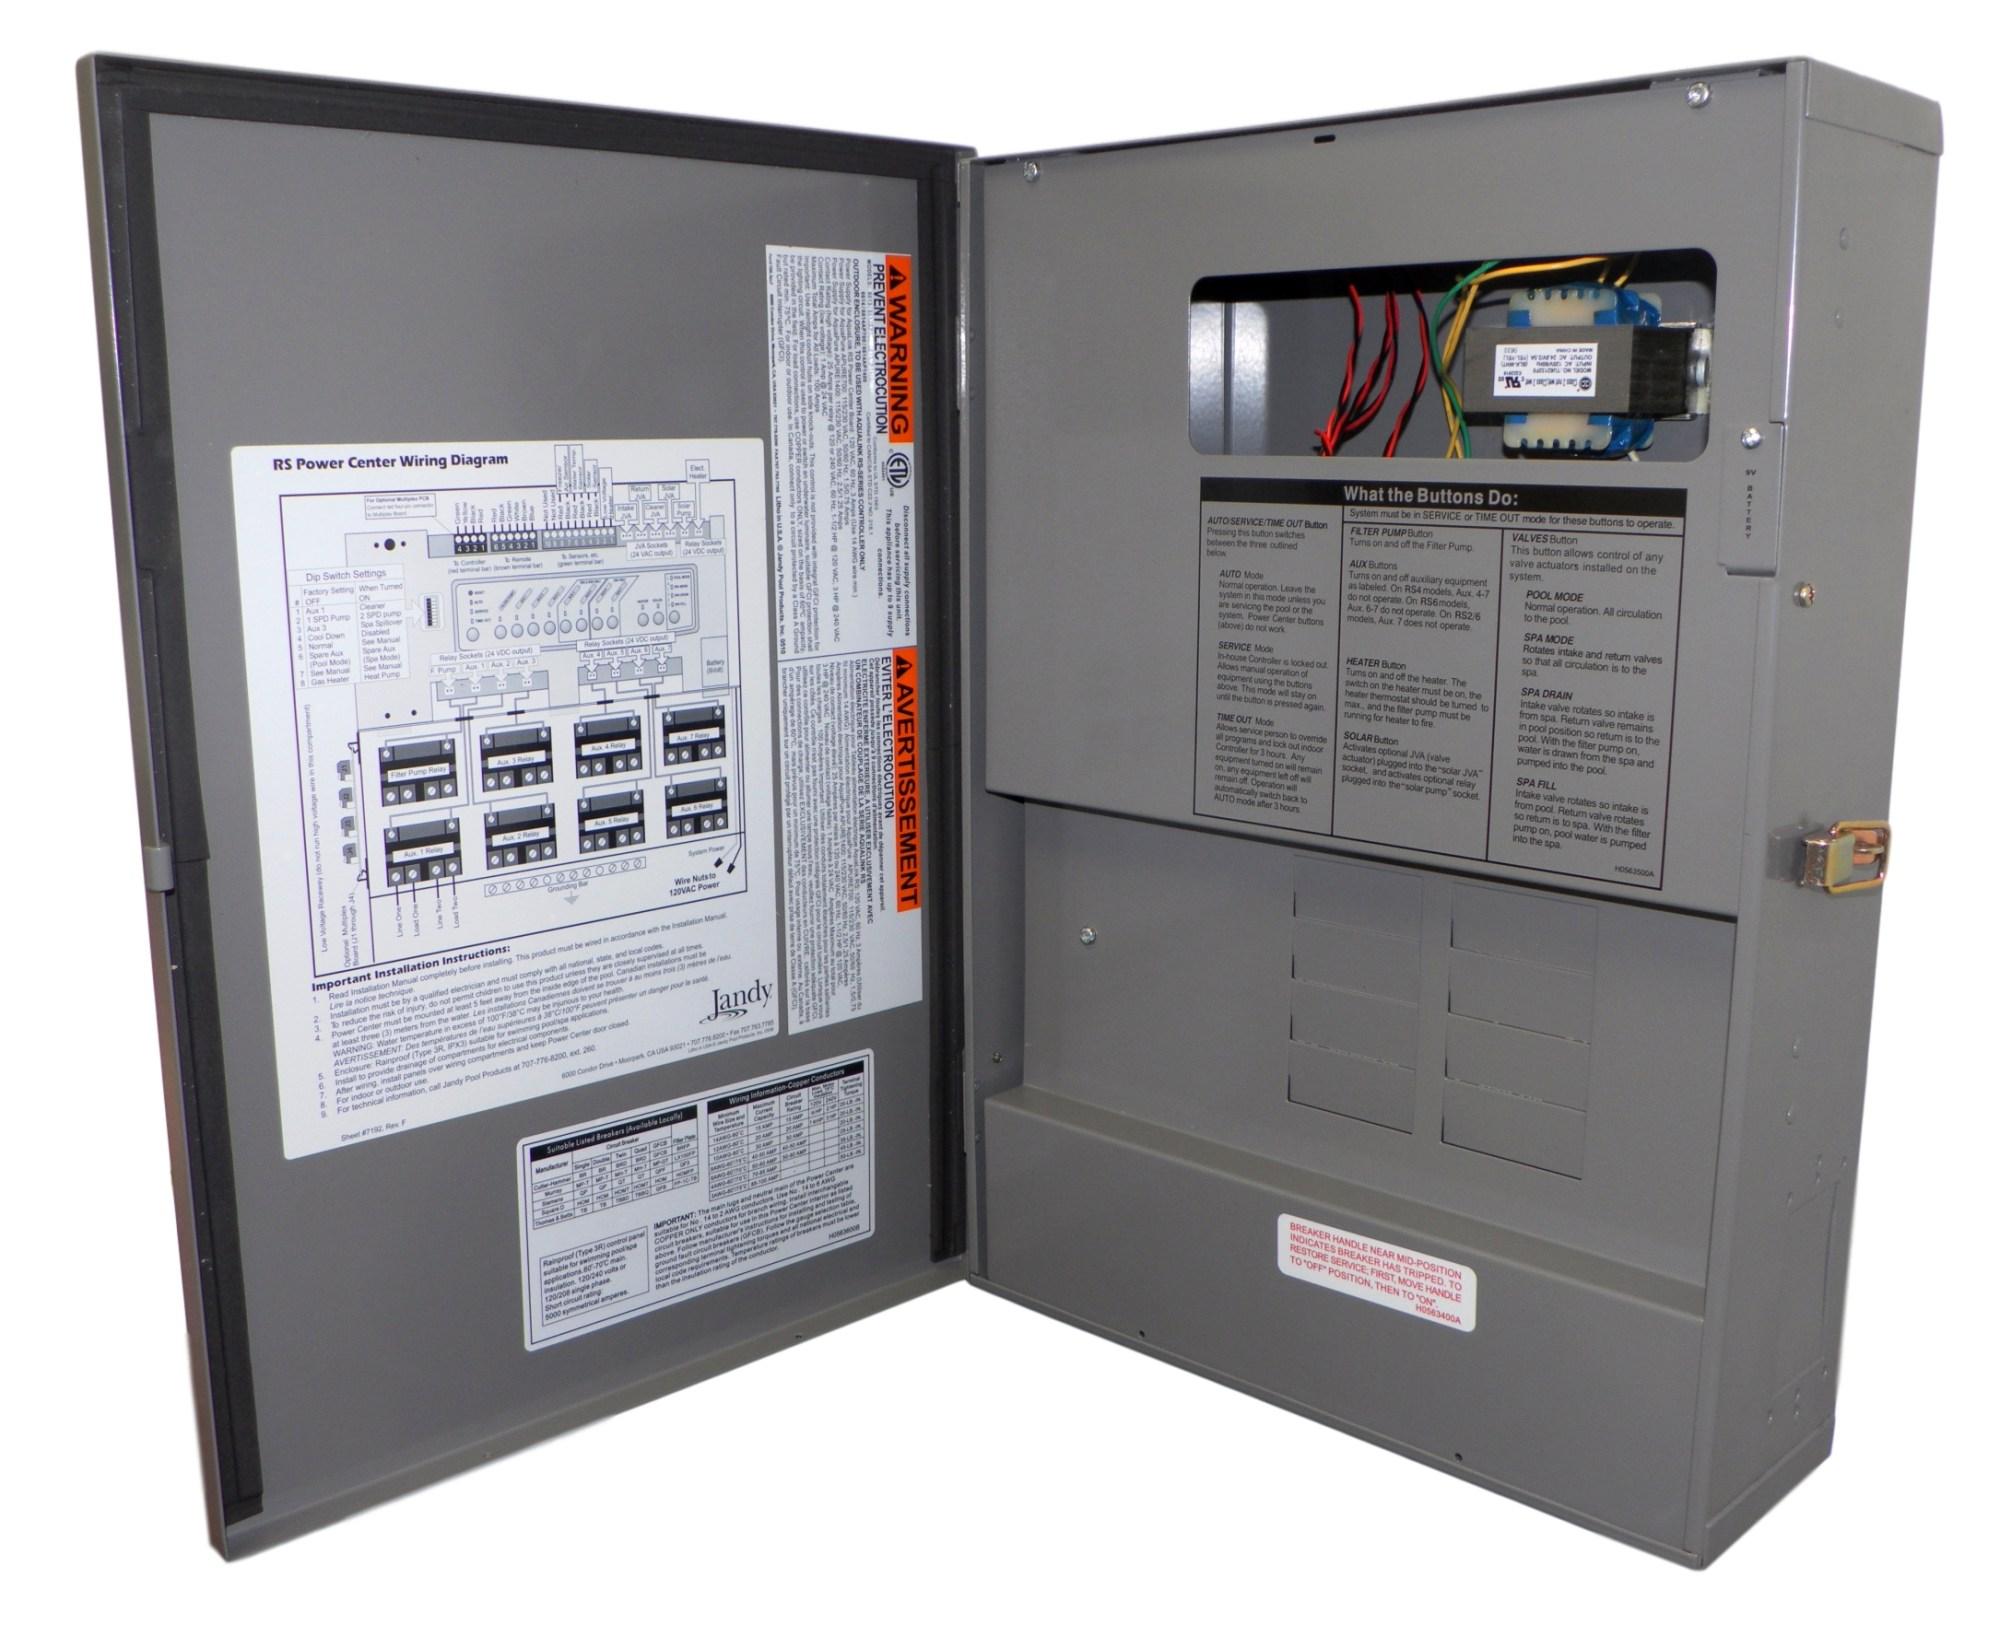 hight resolution of jandy aqualink control panel wiring diagram wiring libraryjandy aqualink control panel wiring diagram